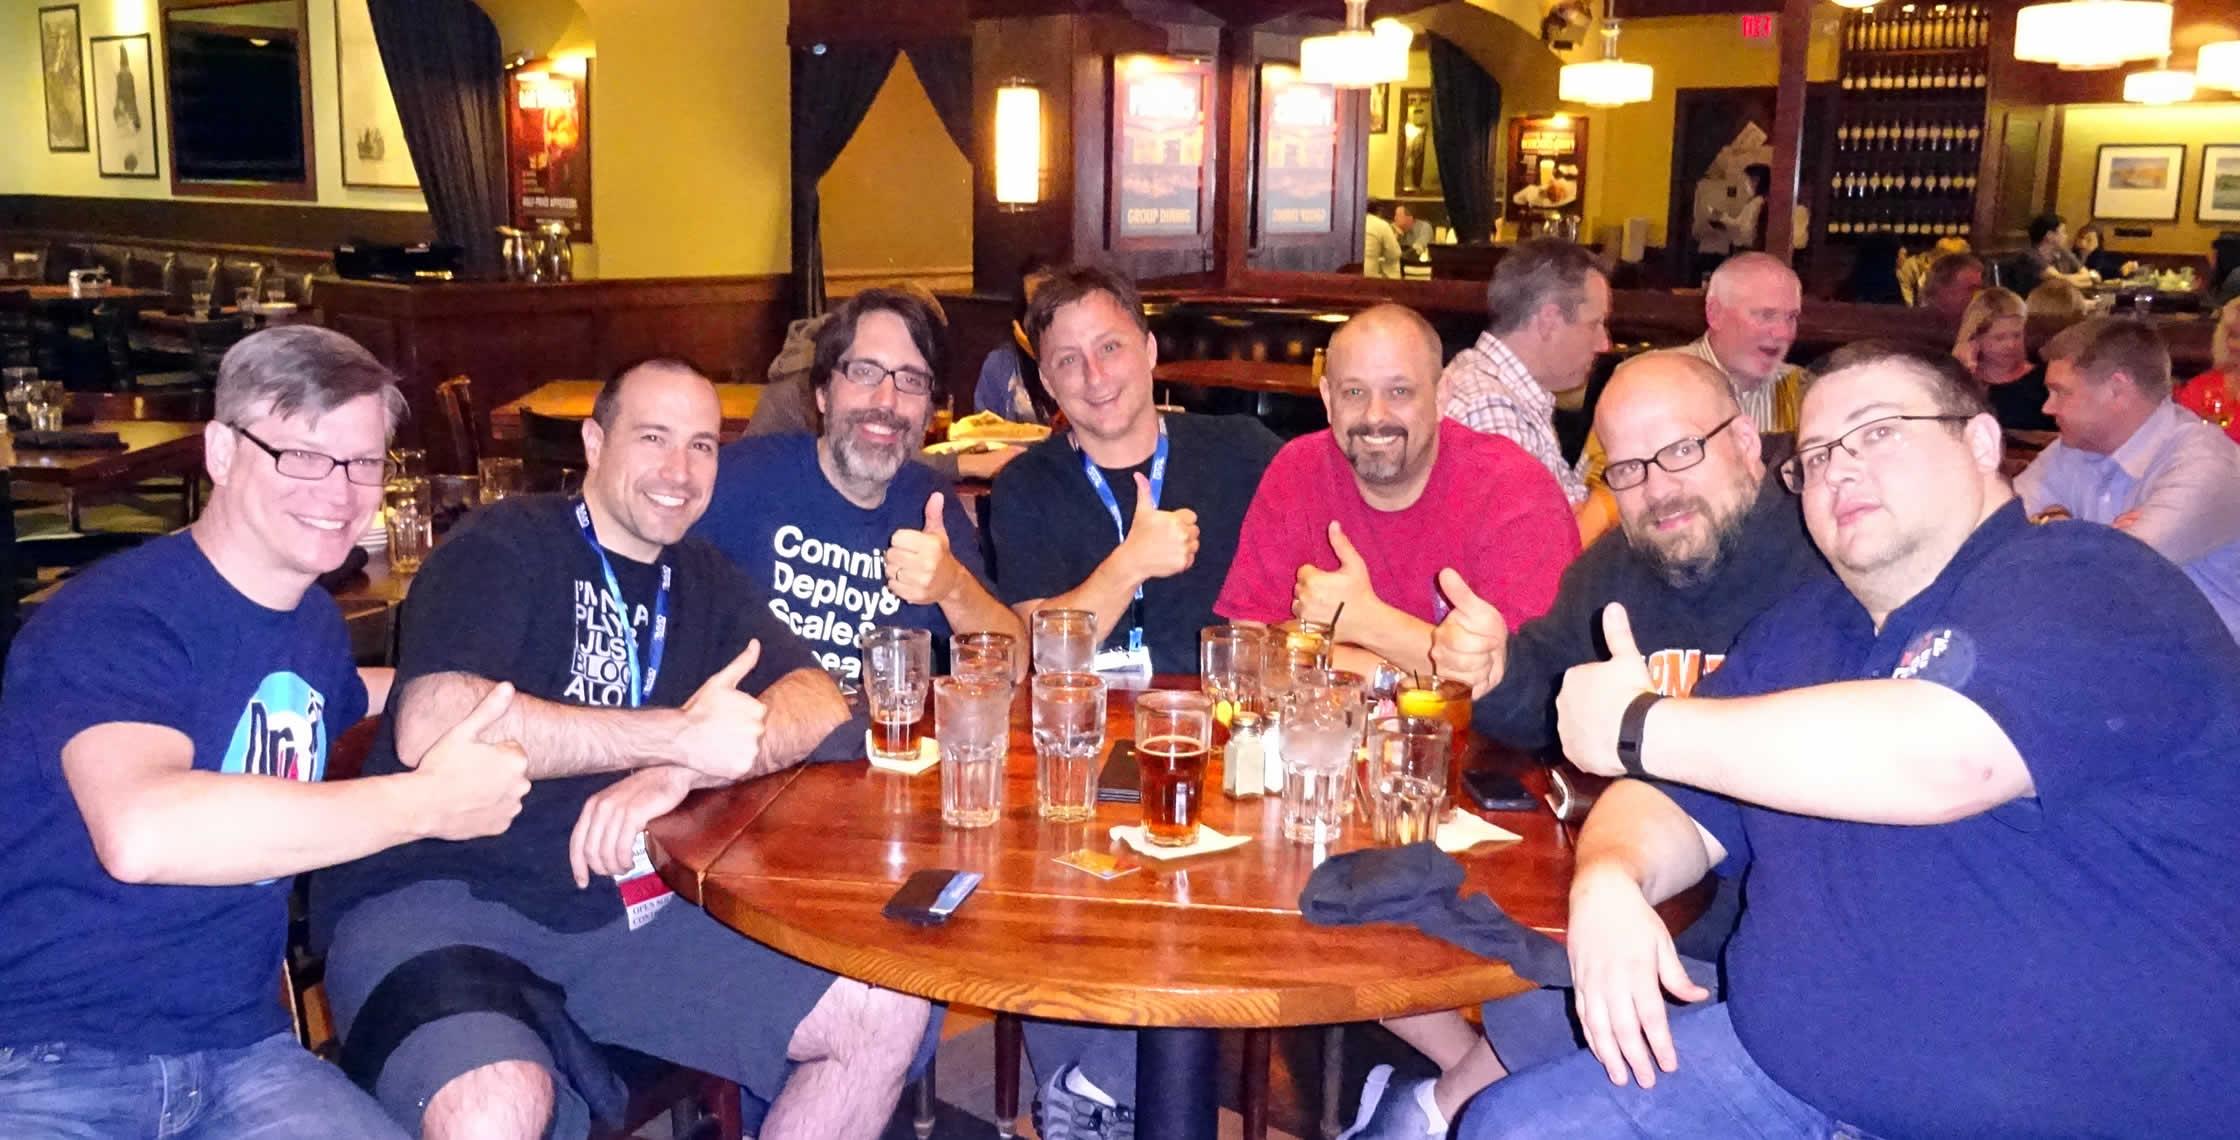 Ben Nadel at dev.Objective() 2015 (Bloomington, MN) with: Tim Cunningham, Ray Camden, Dan Wilson, Dave Ferguson, Jason Dean, and Kev McCabe